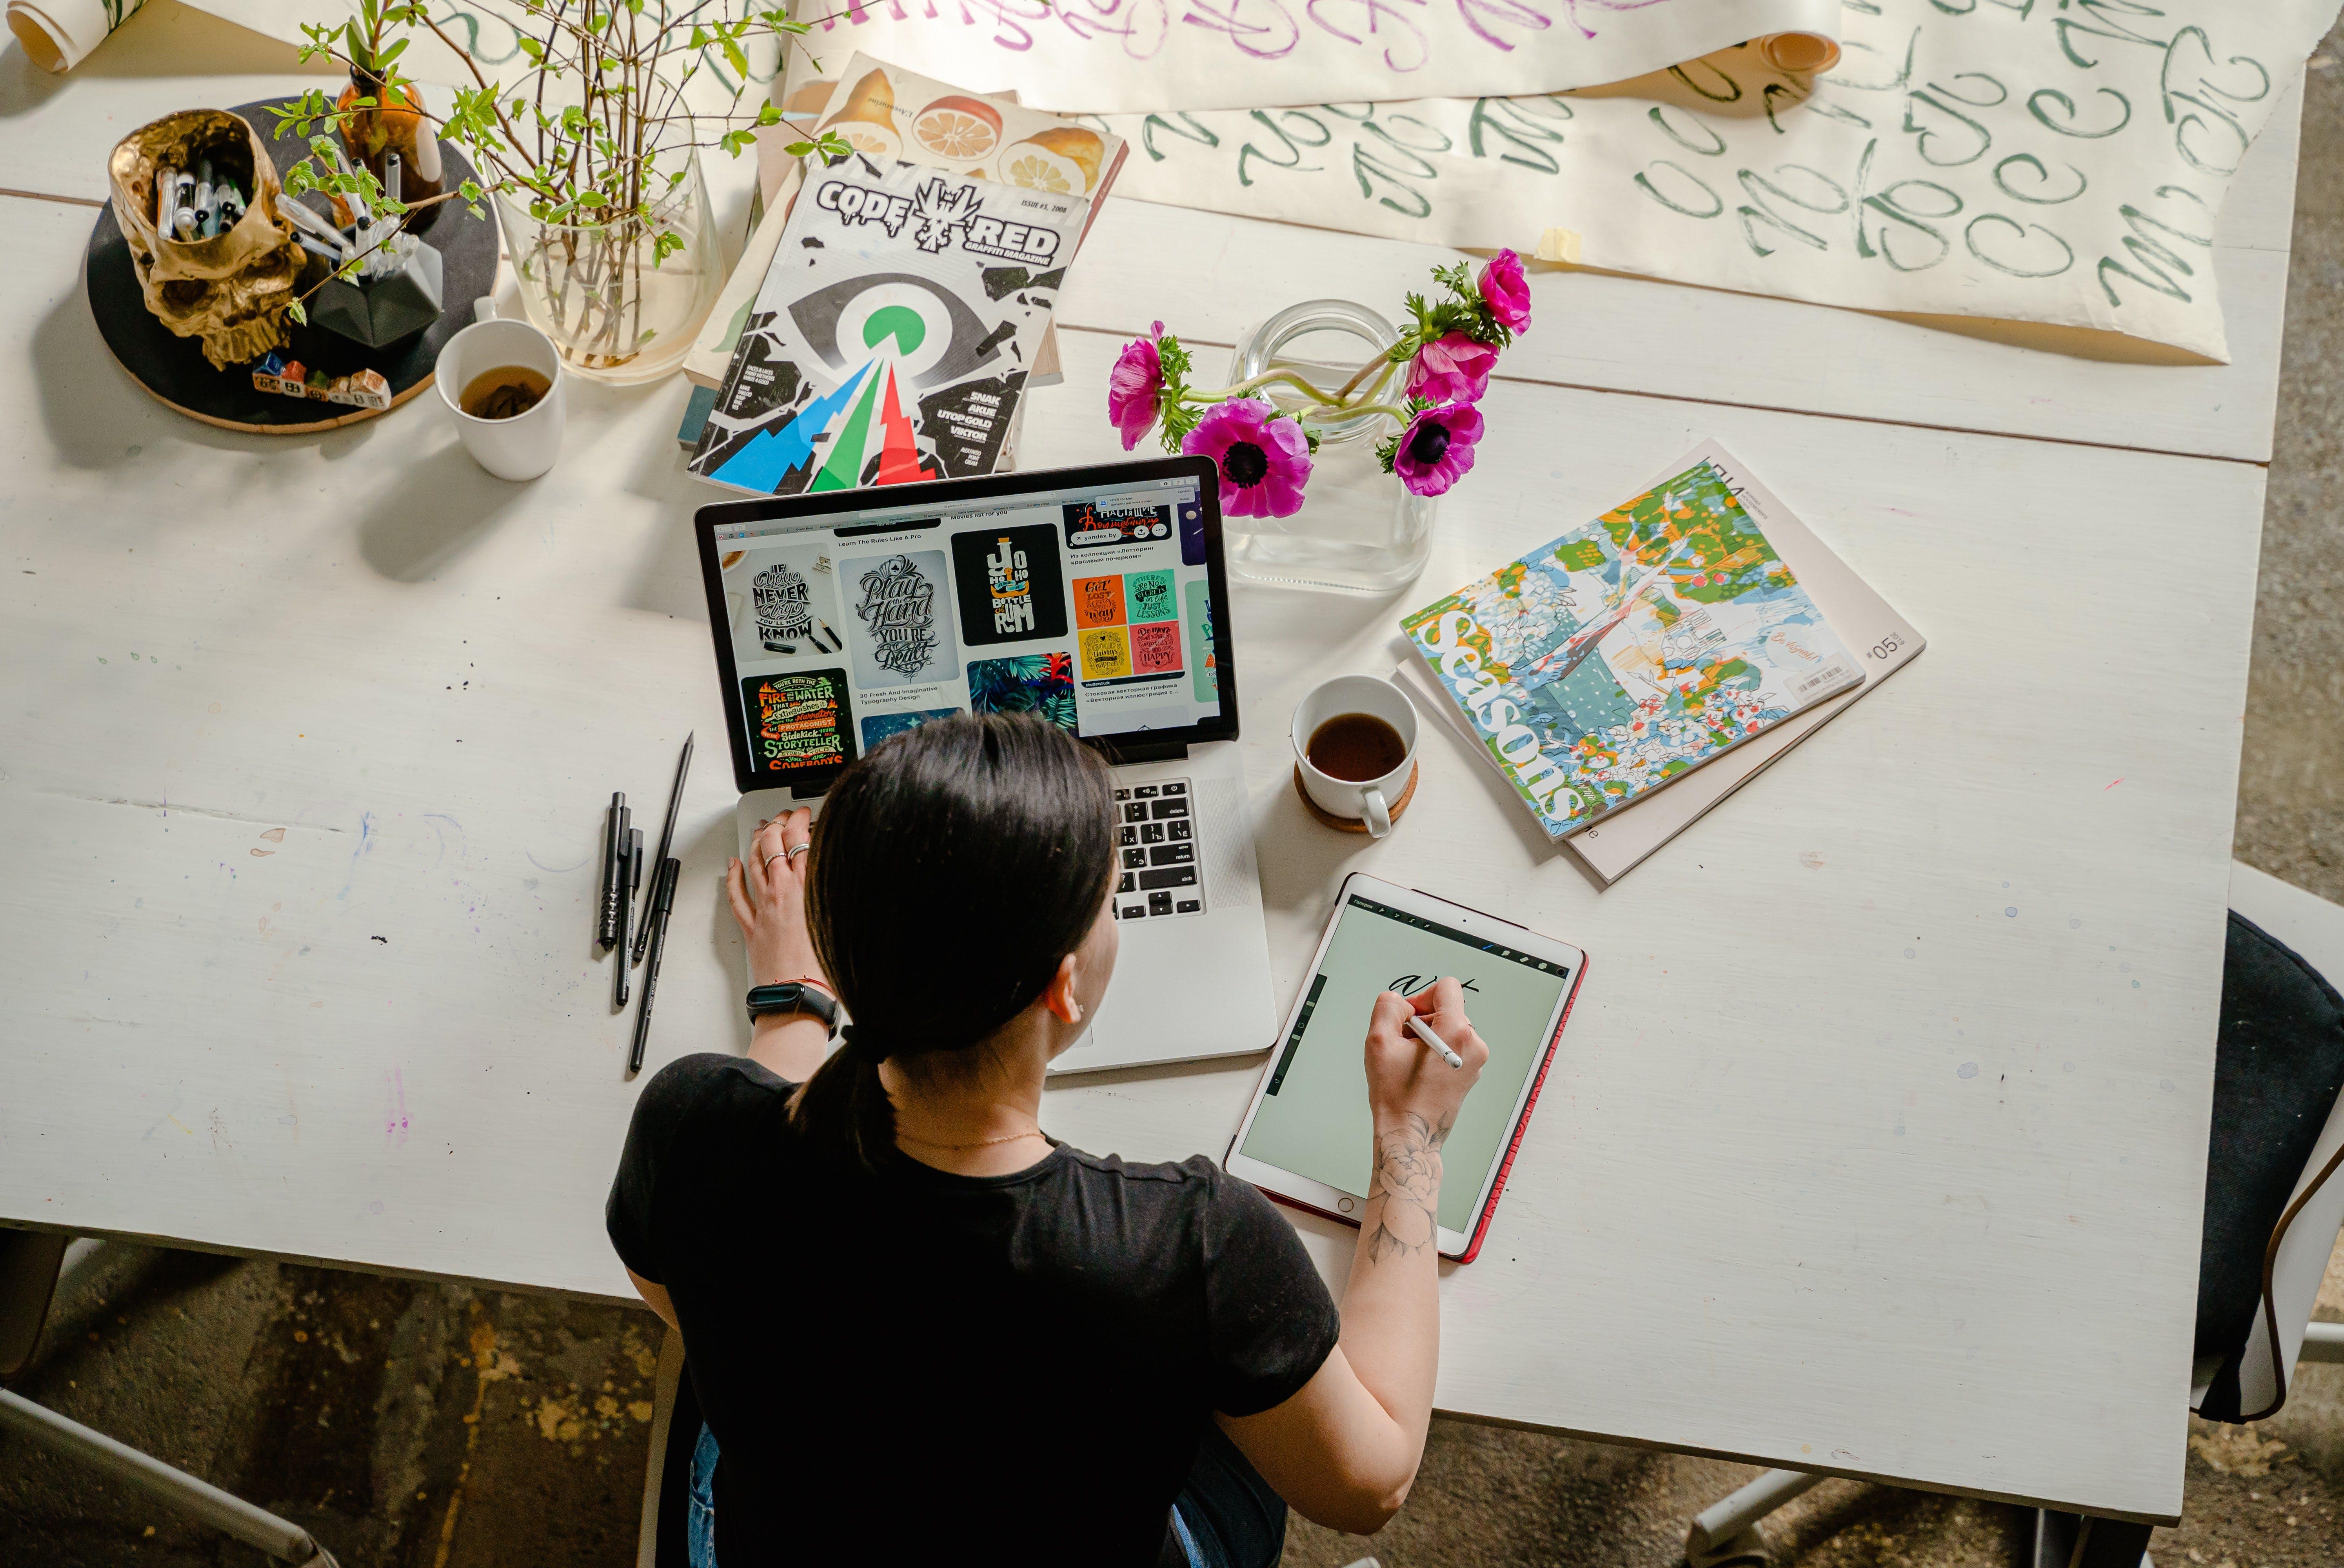 Student producing creative work